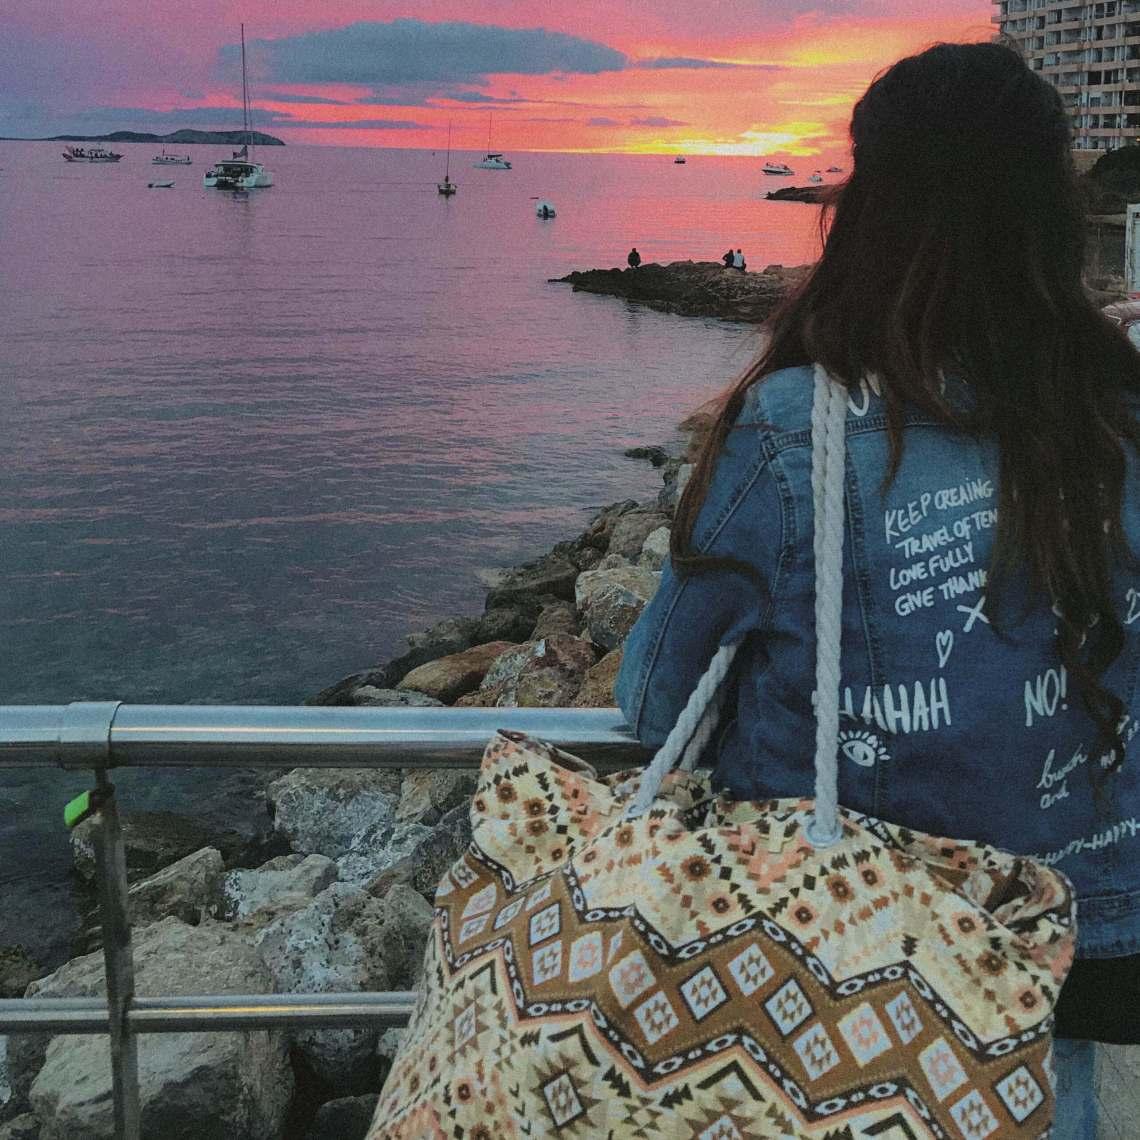 sant antonio tramonto rosa-bohogirl